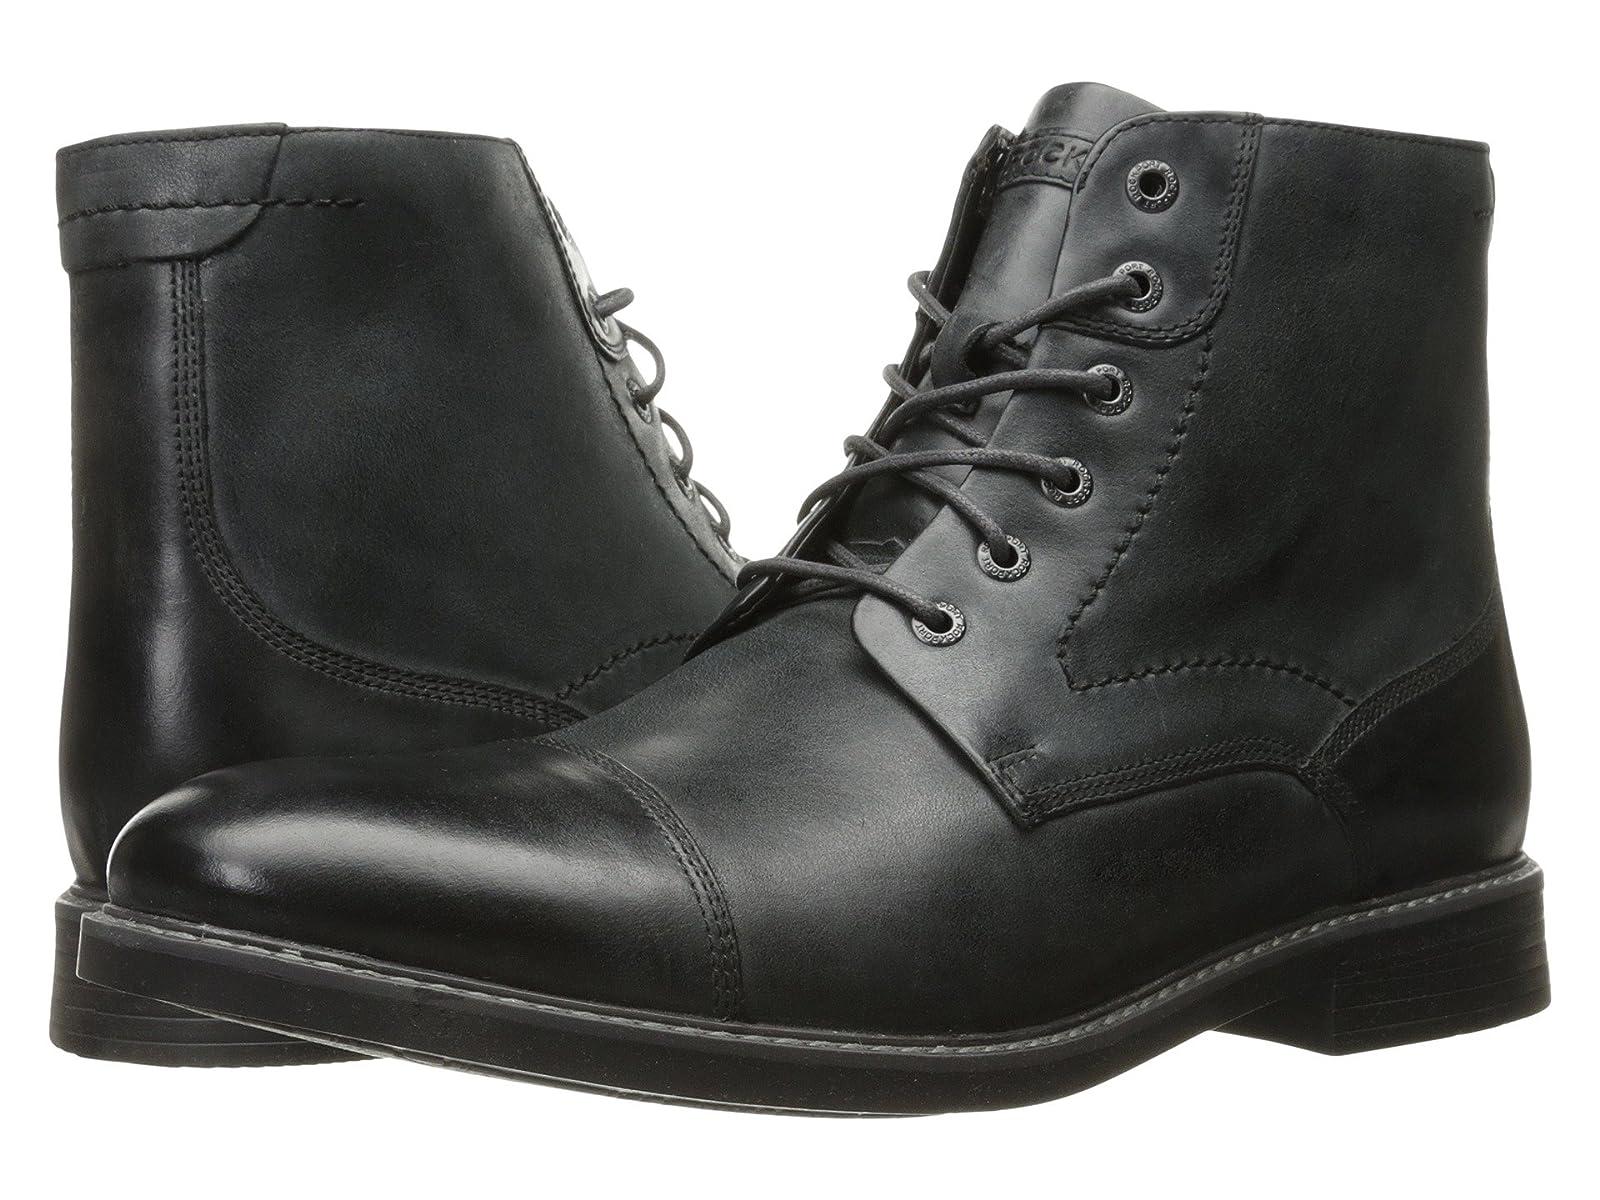 Rockport Classic Break Cap Toe Zip BootCheap and distinctive eye-catching shoes